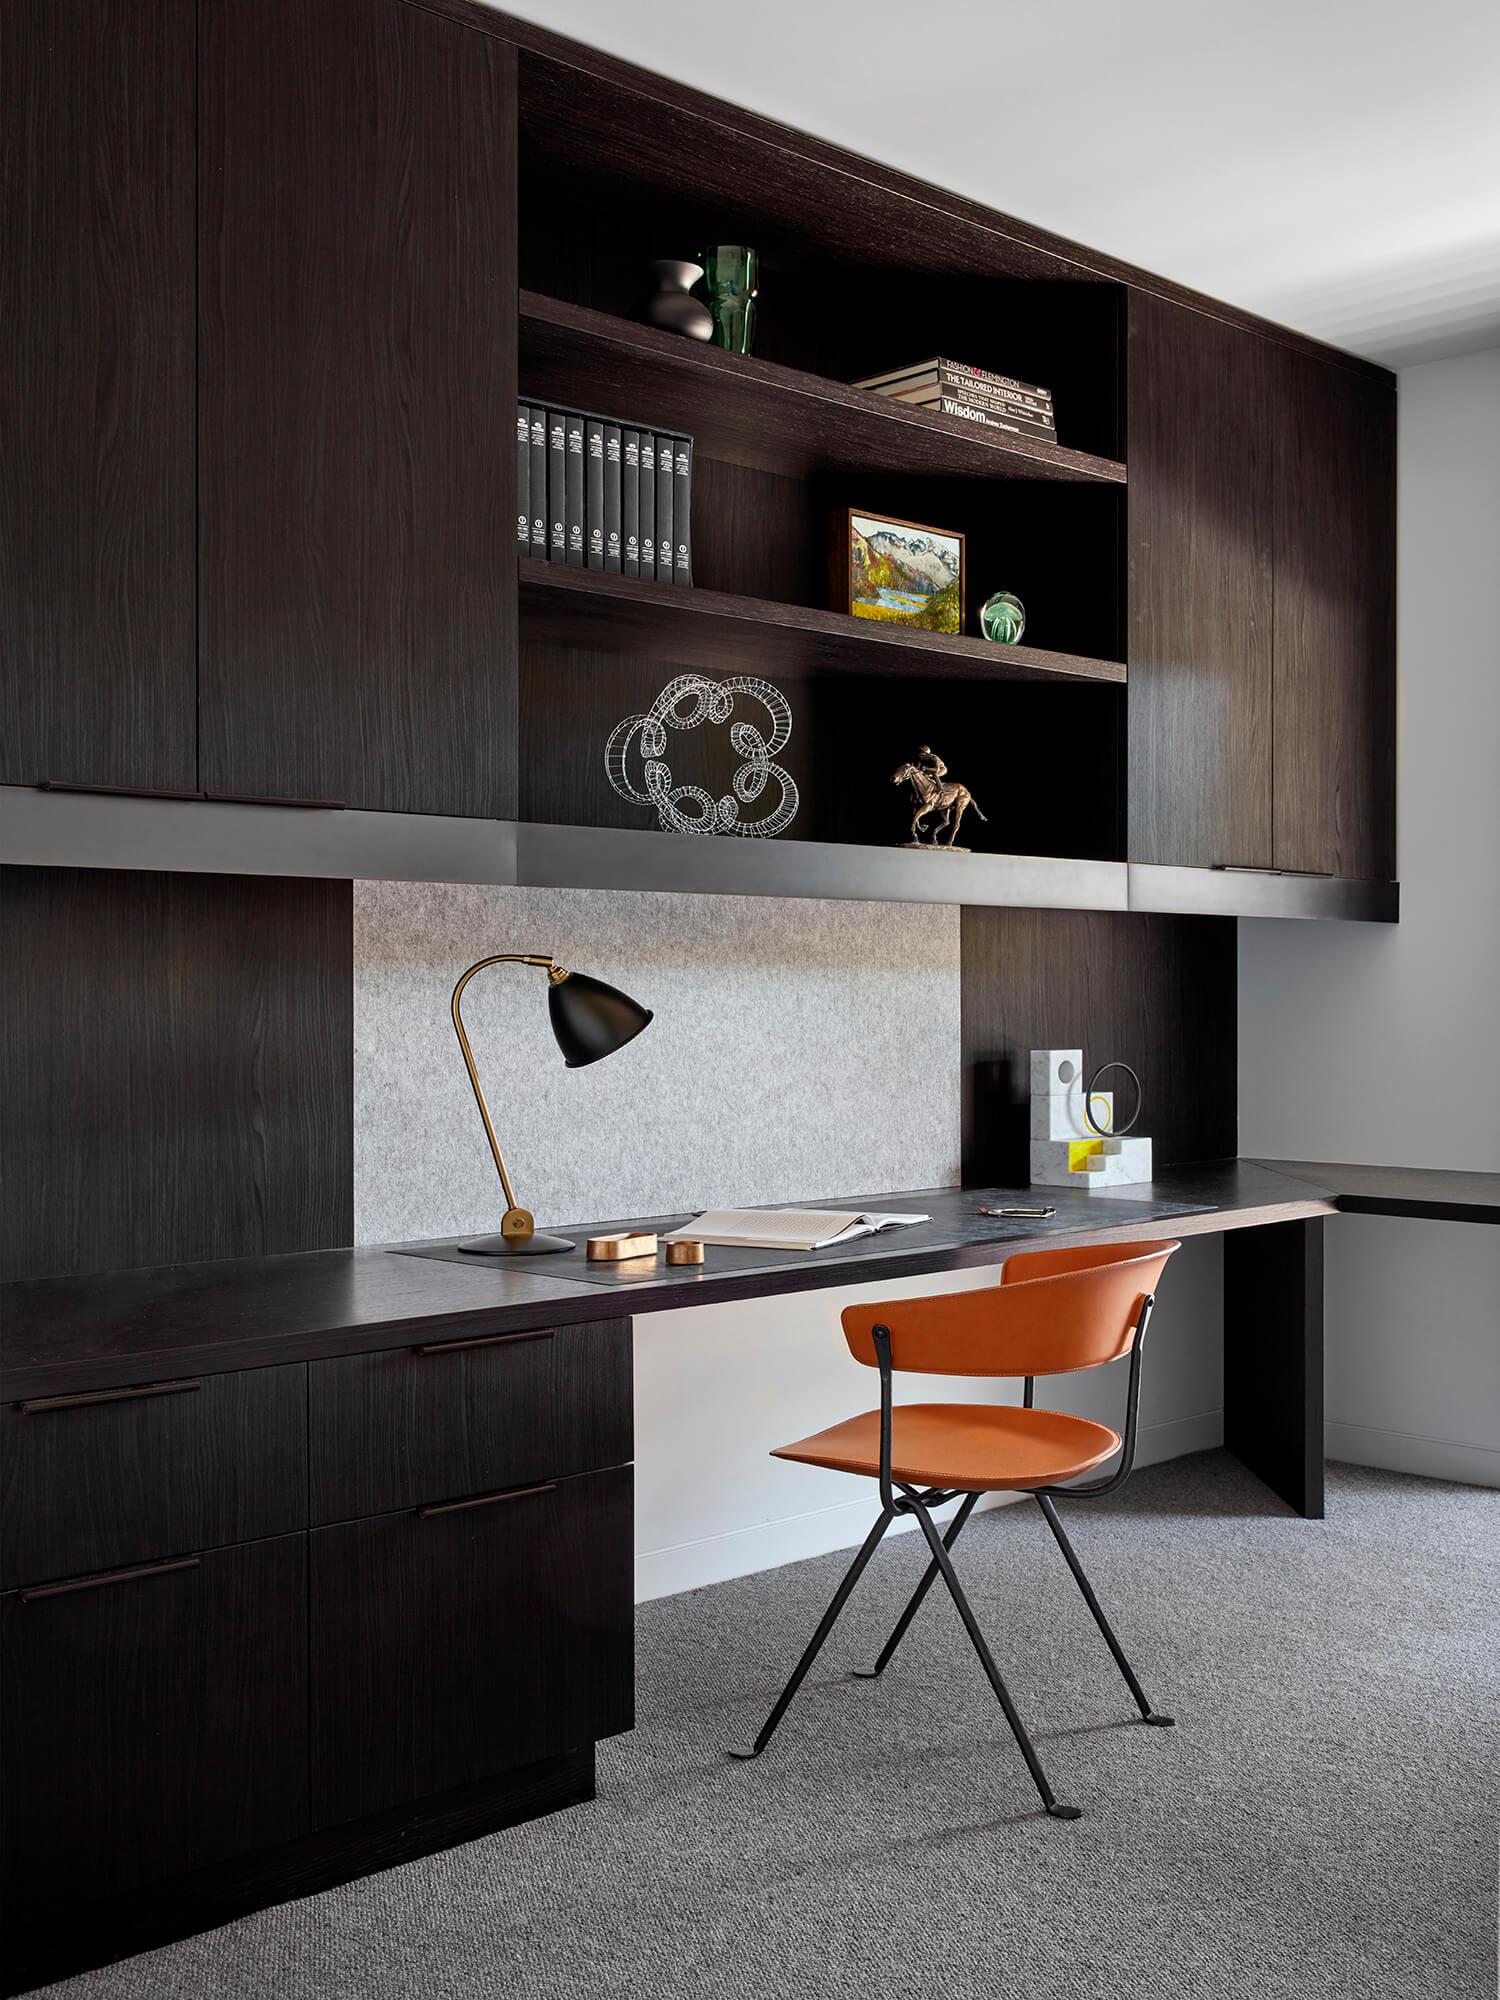 est living interiors Ceres Gable House Tecture 05